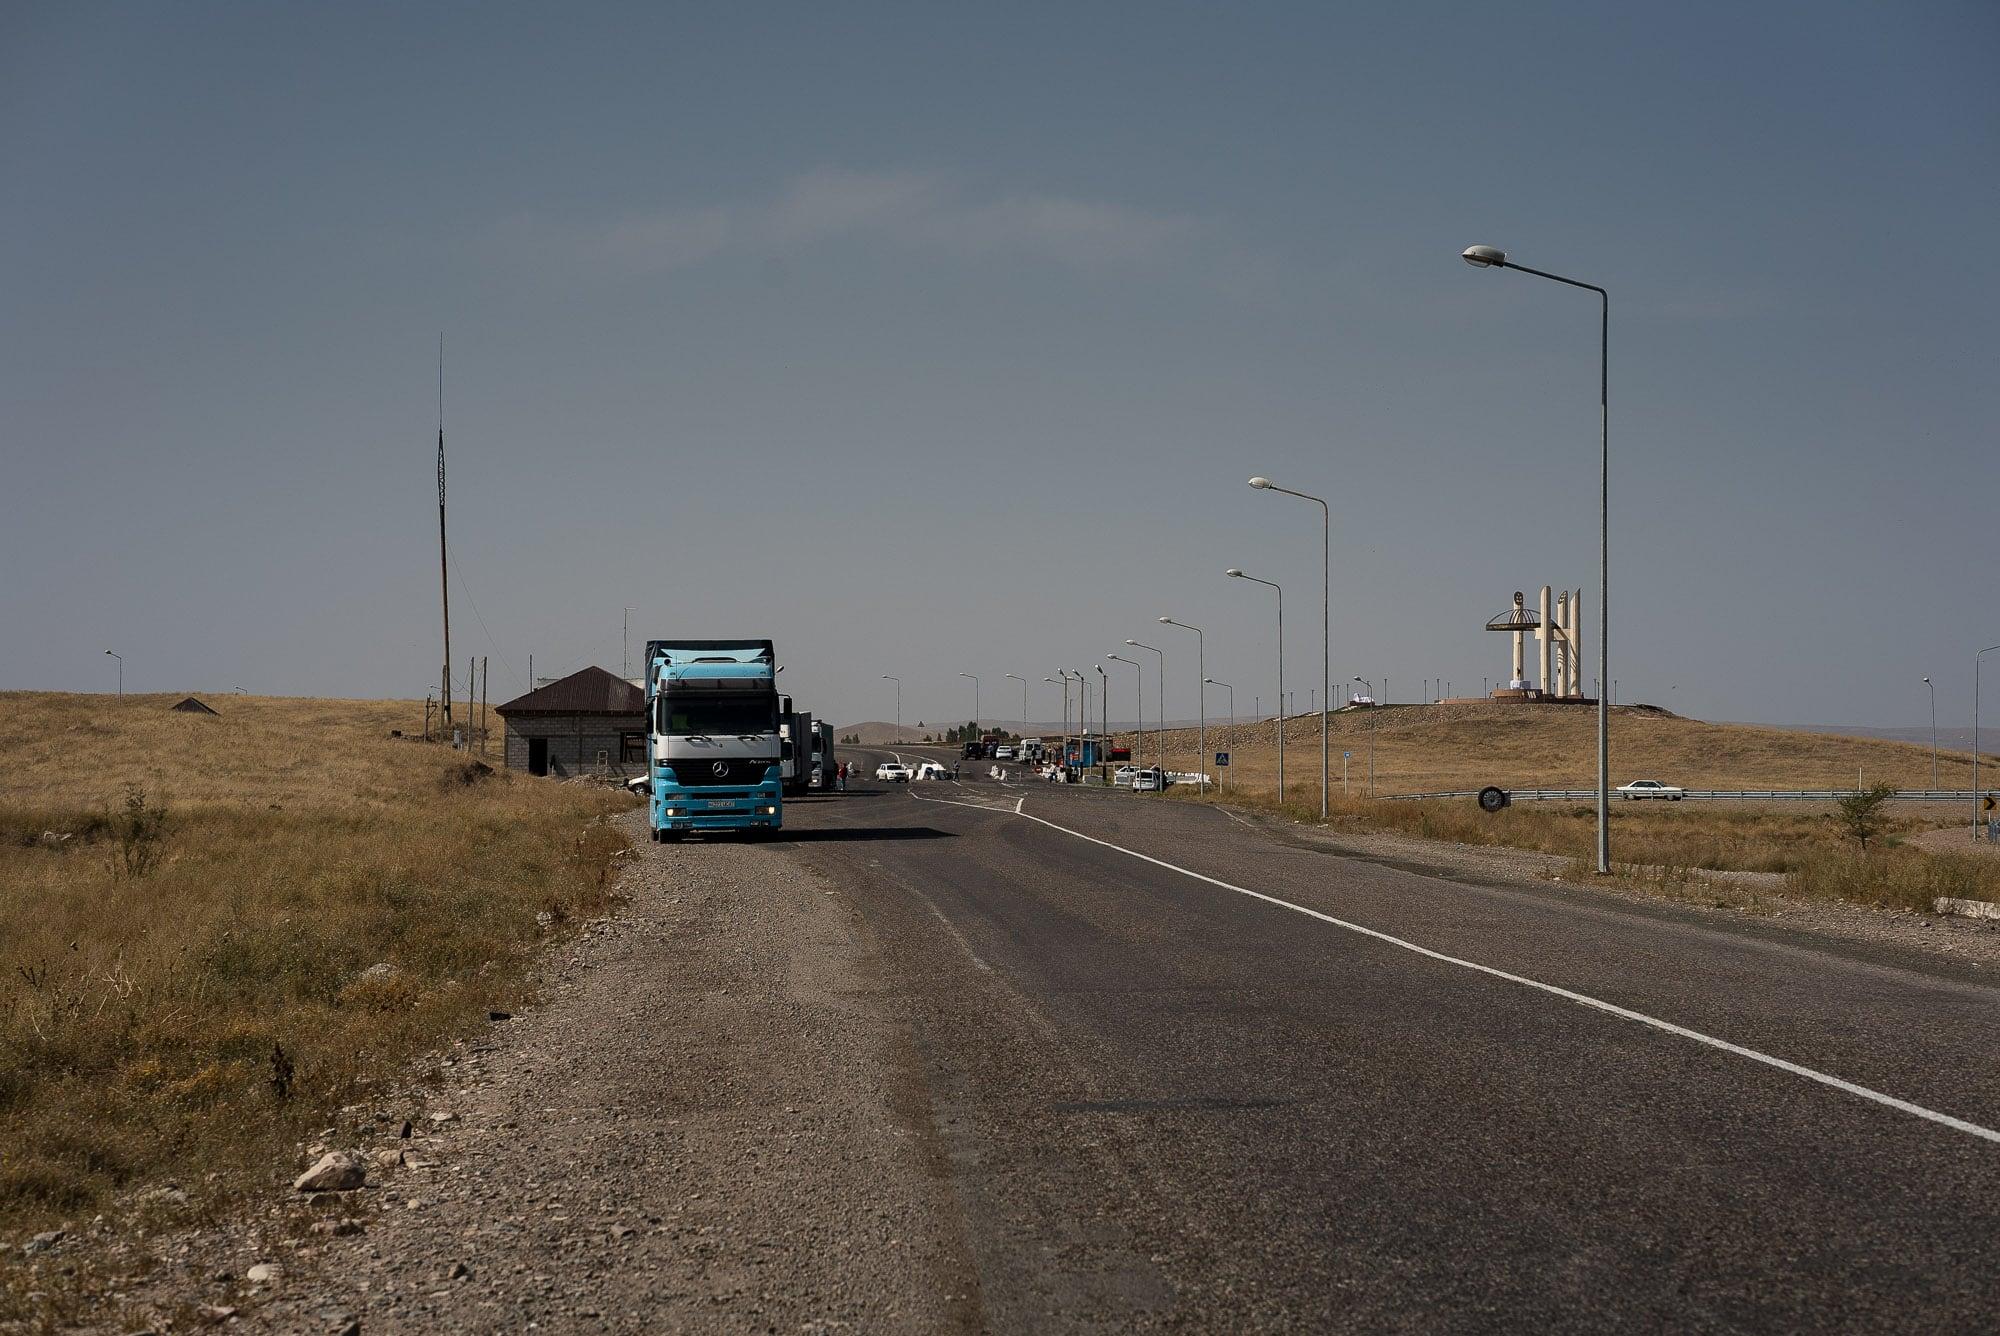 pre-border checkpoint